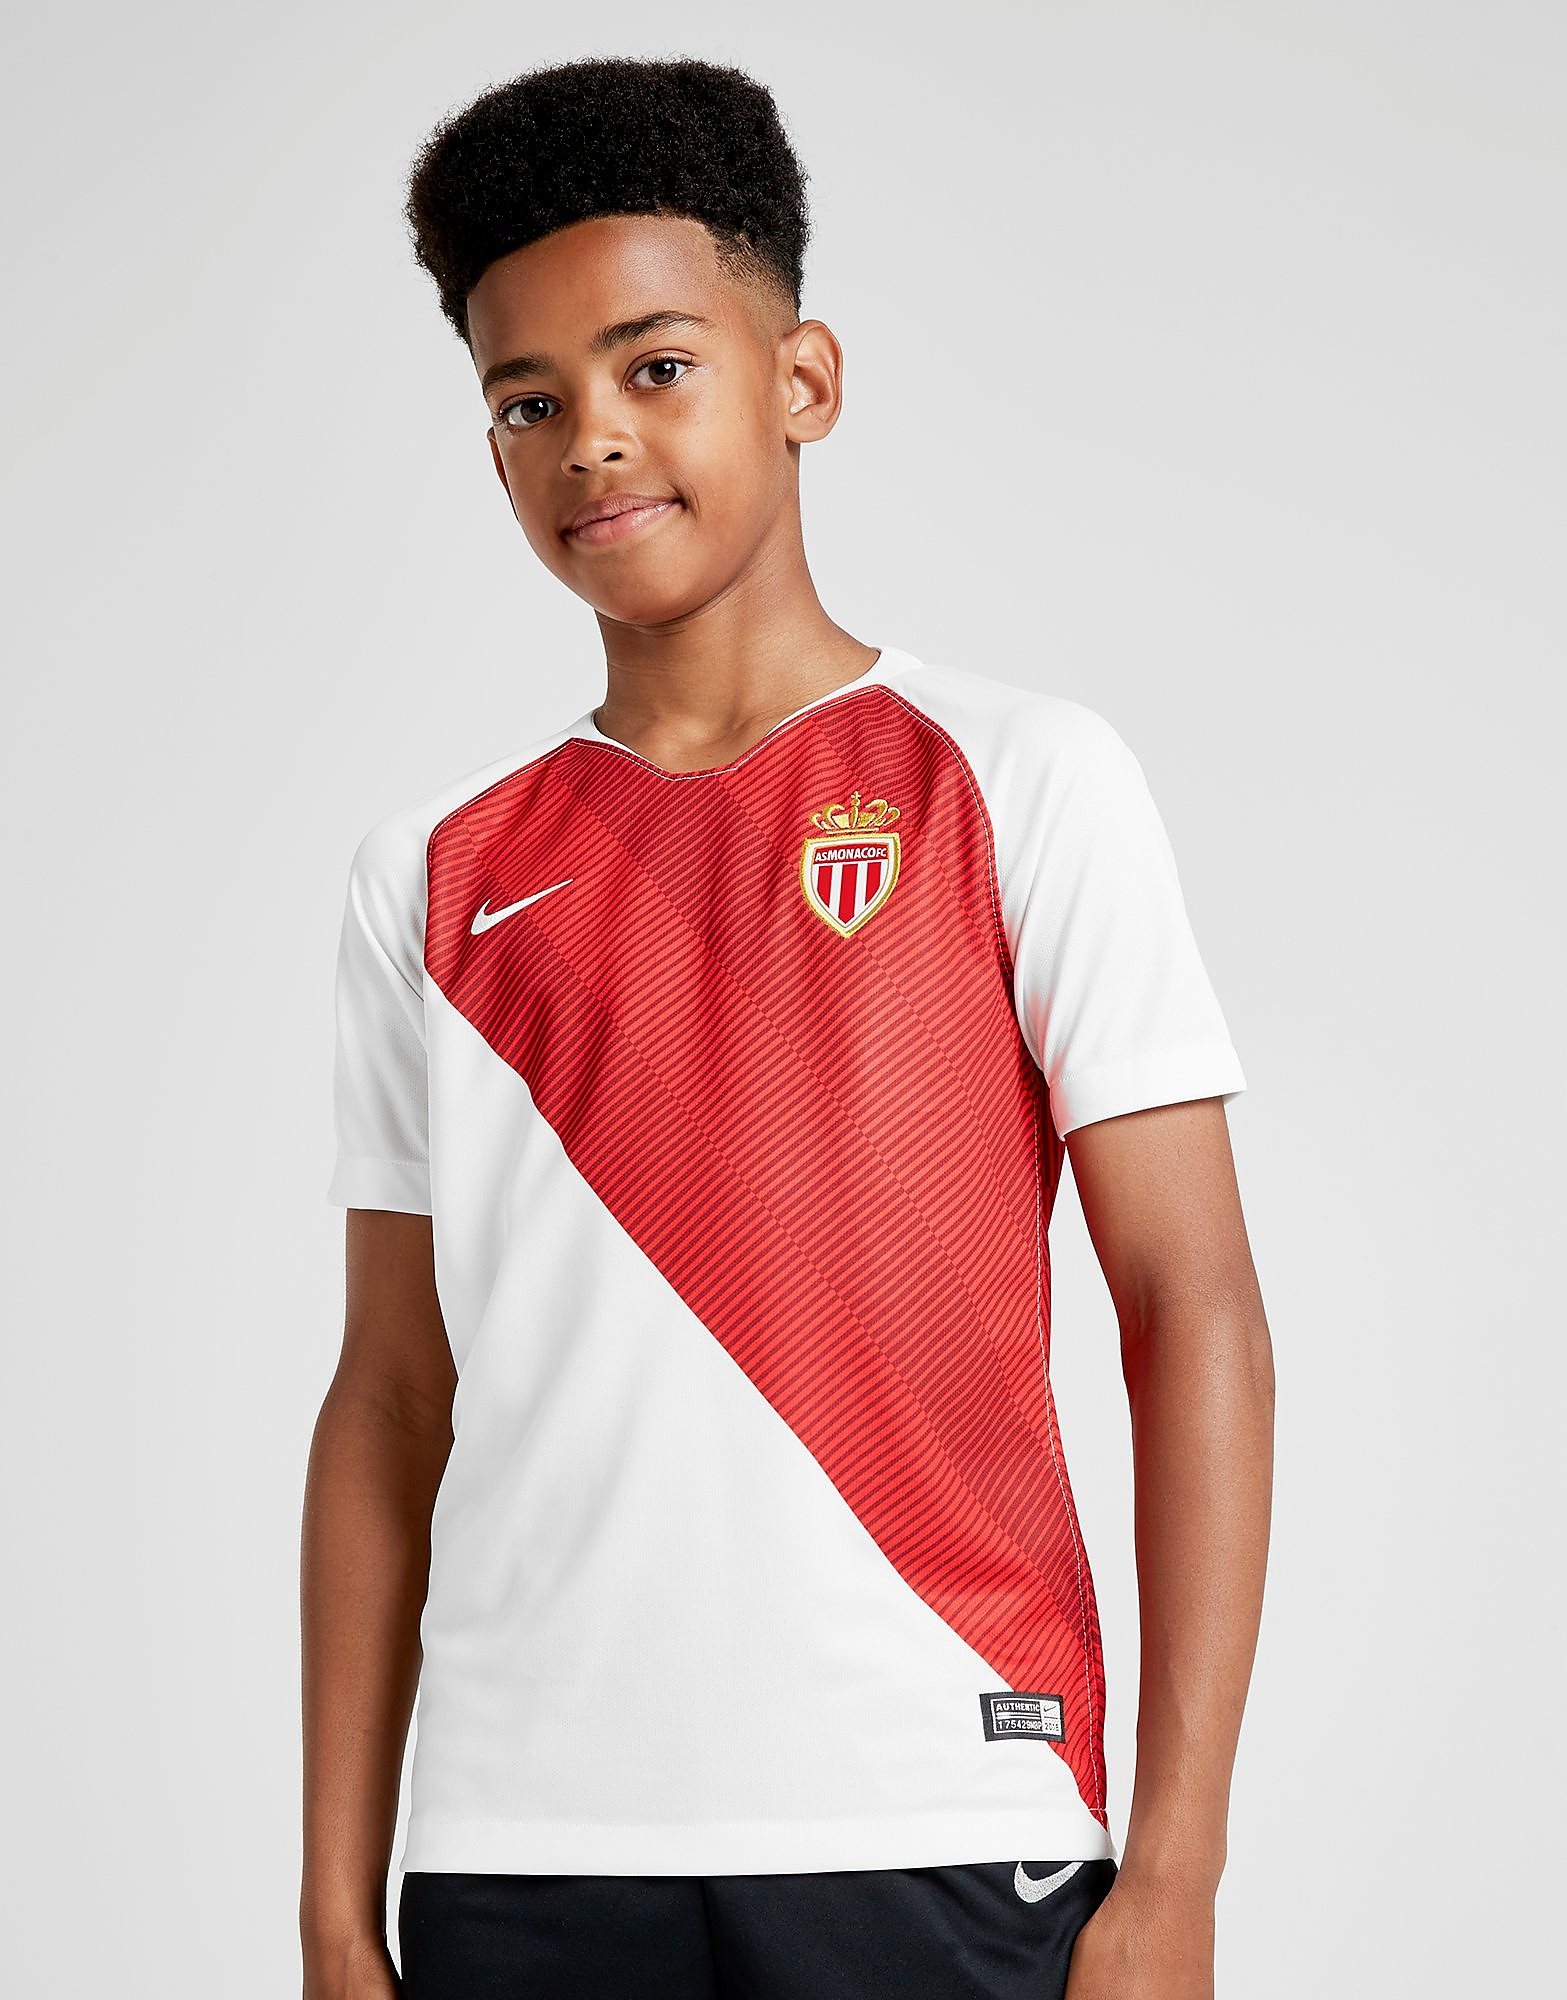 Nike AS Monaco 2018/19 Home Shirt Junior - Wit - Kind